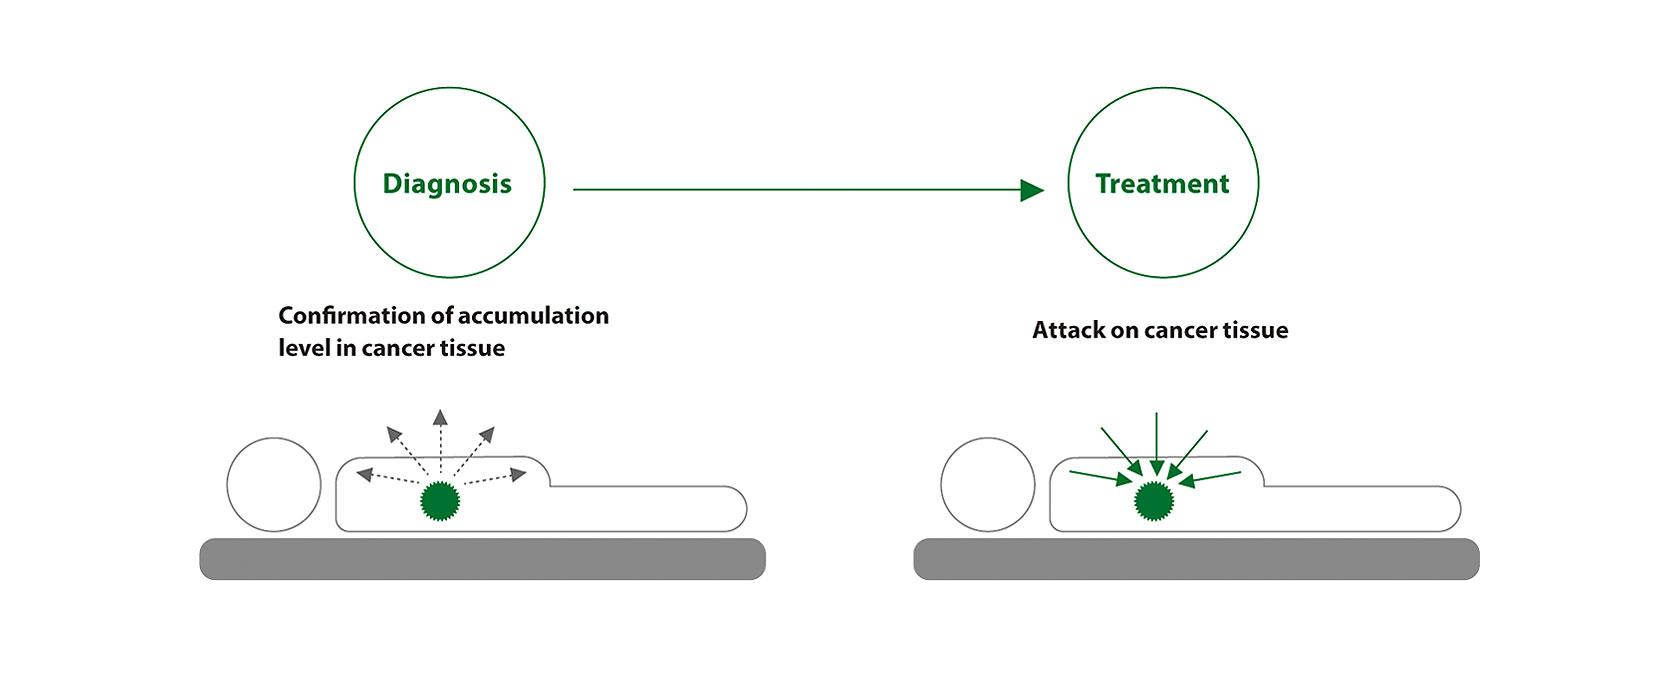 [image] Diagnosis leading to treatment